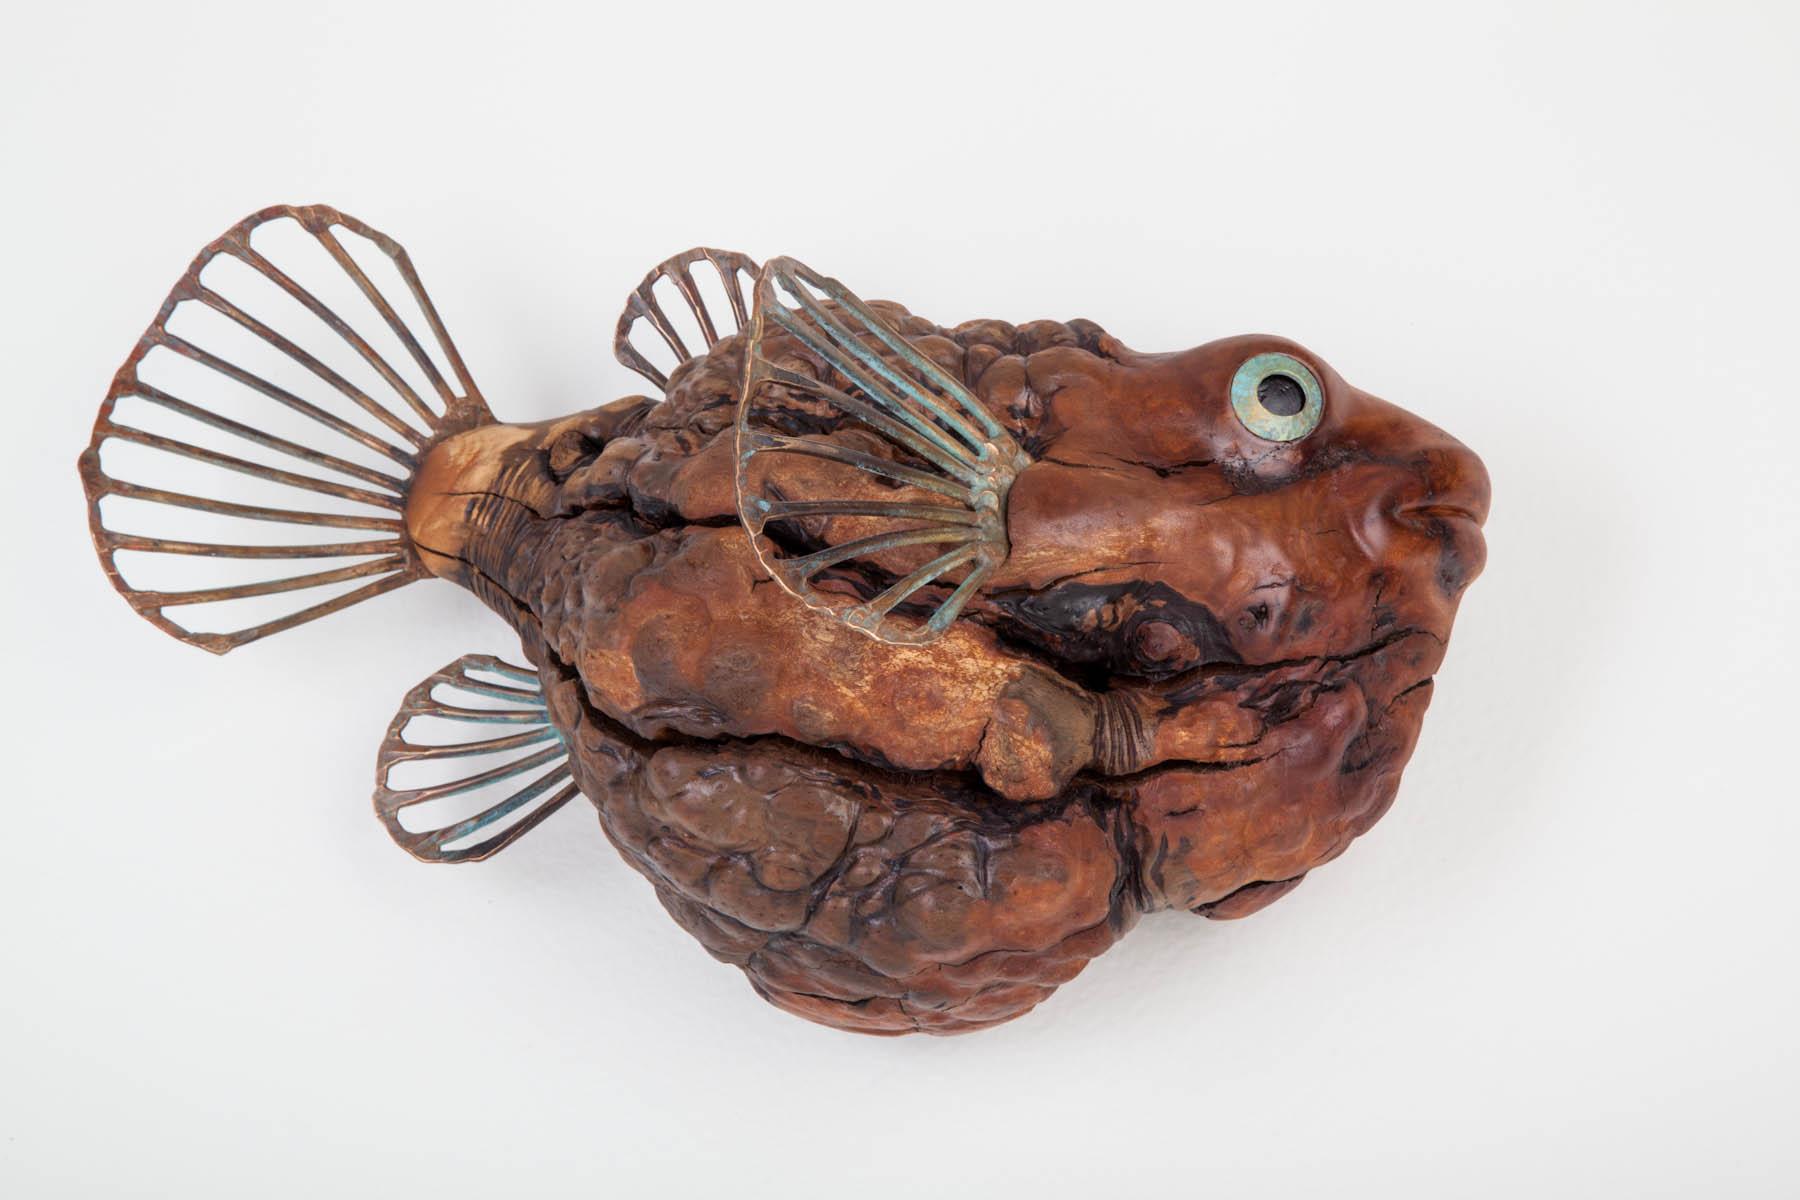 fish sculpture for sale